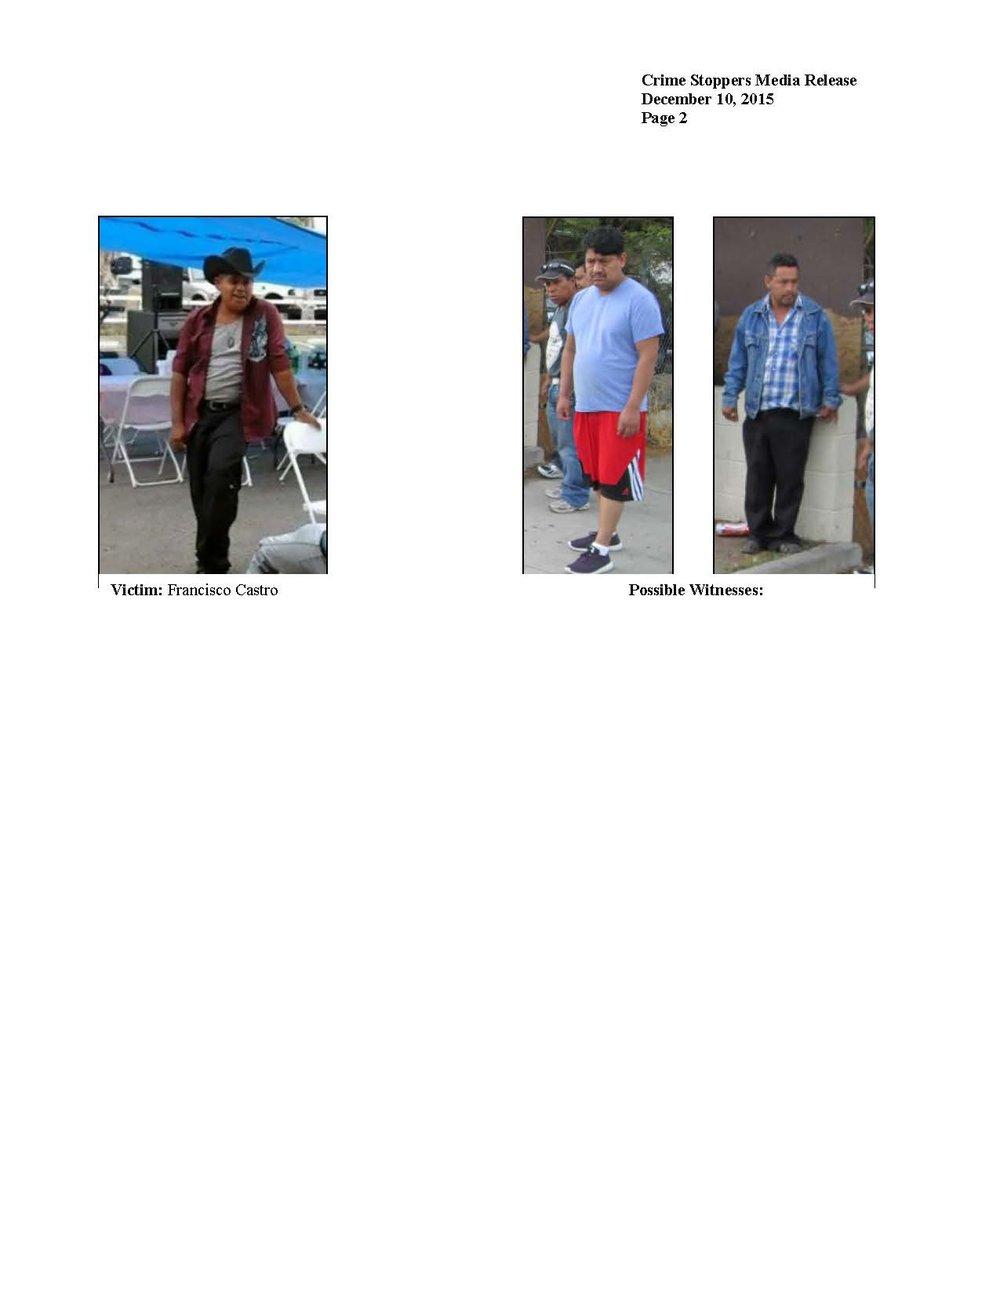 121015 Francisco Castro update_Page_2